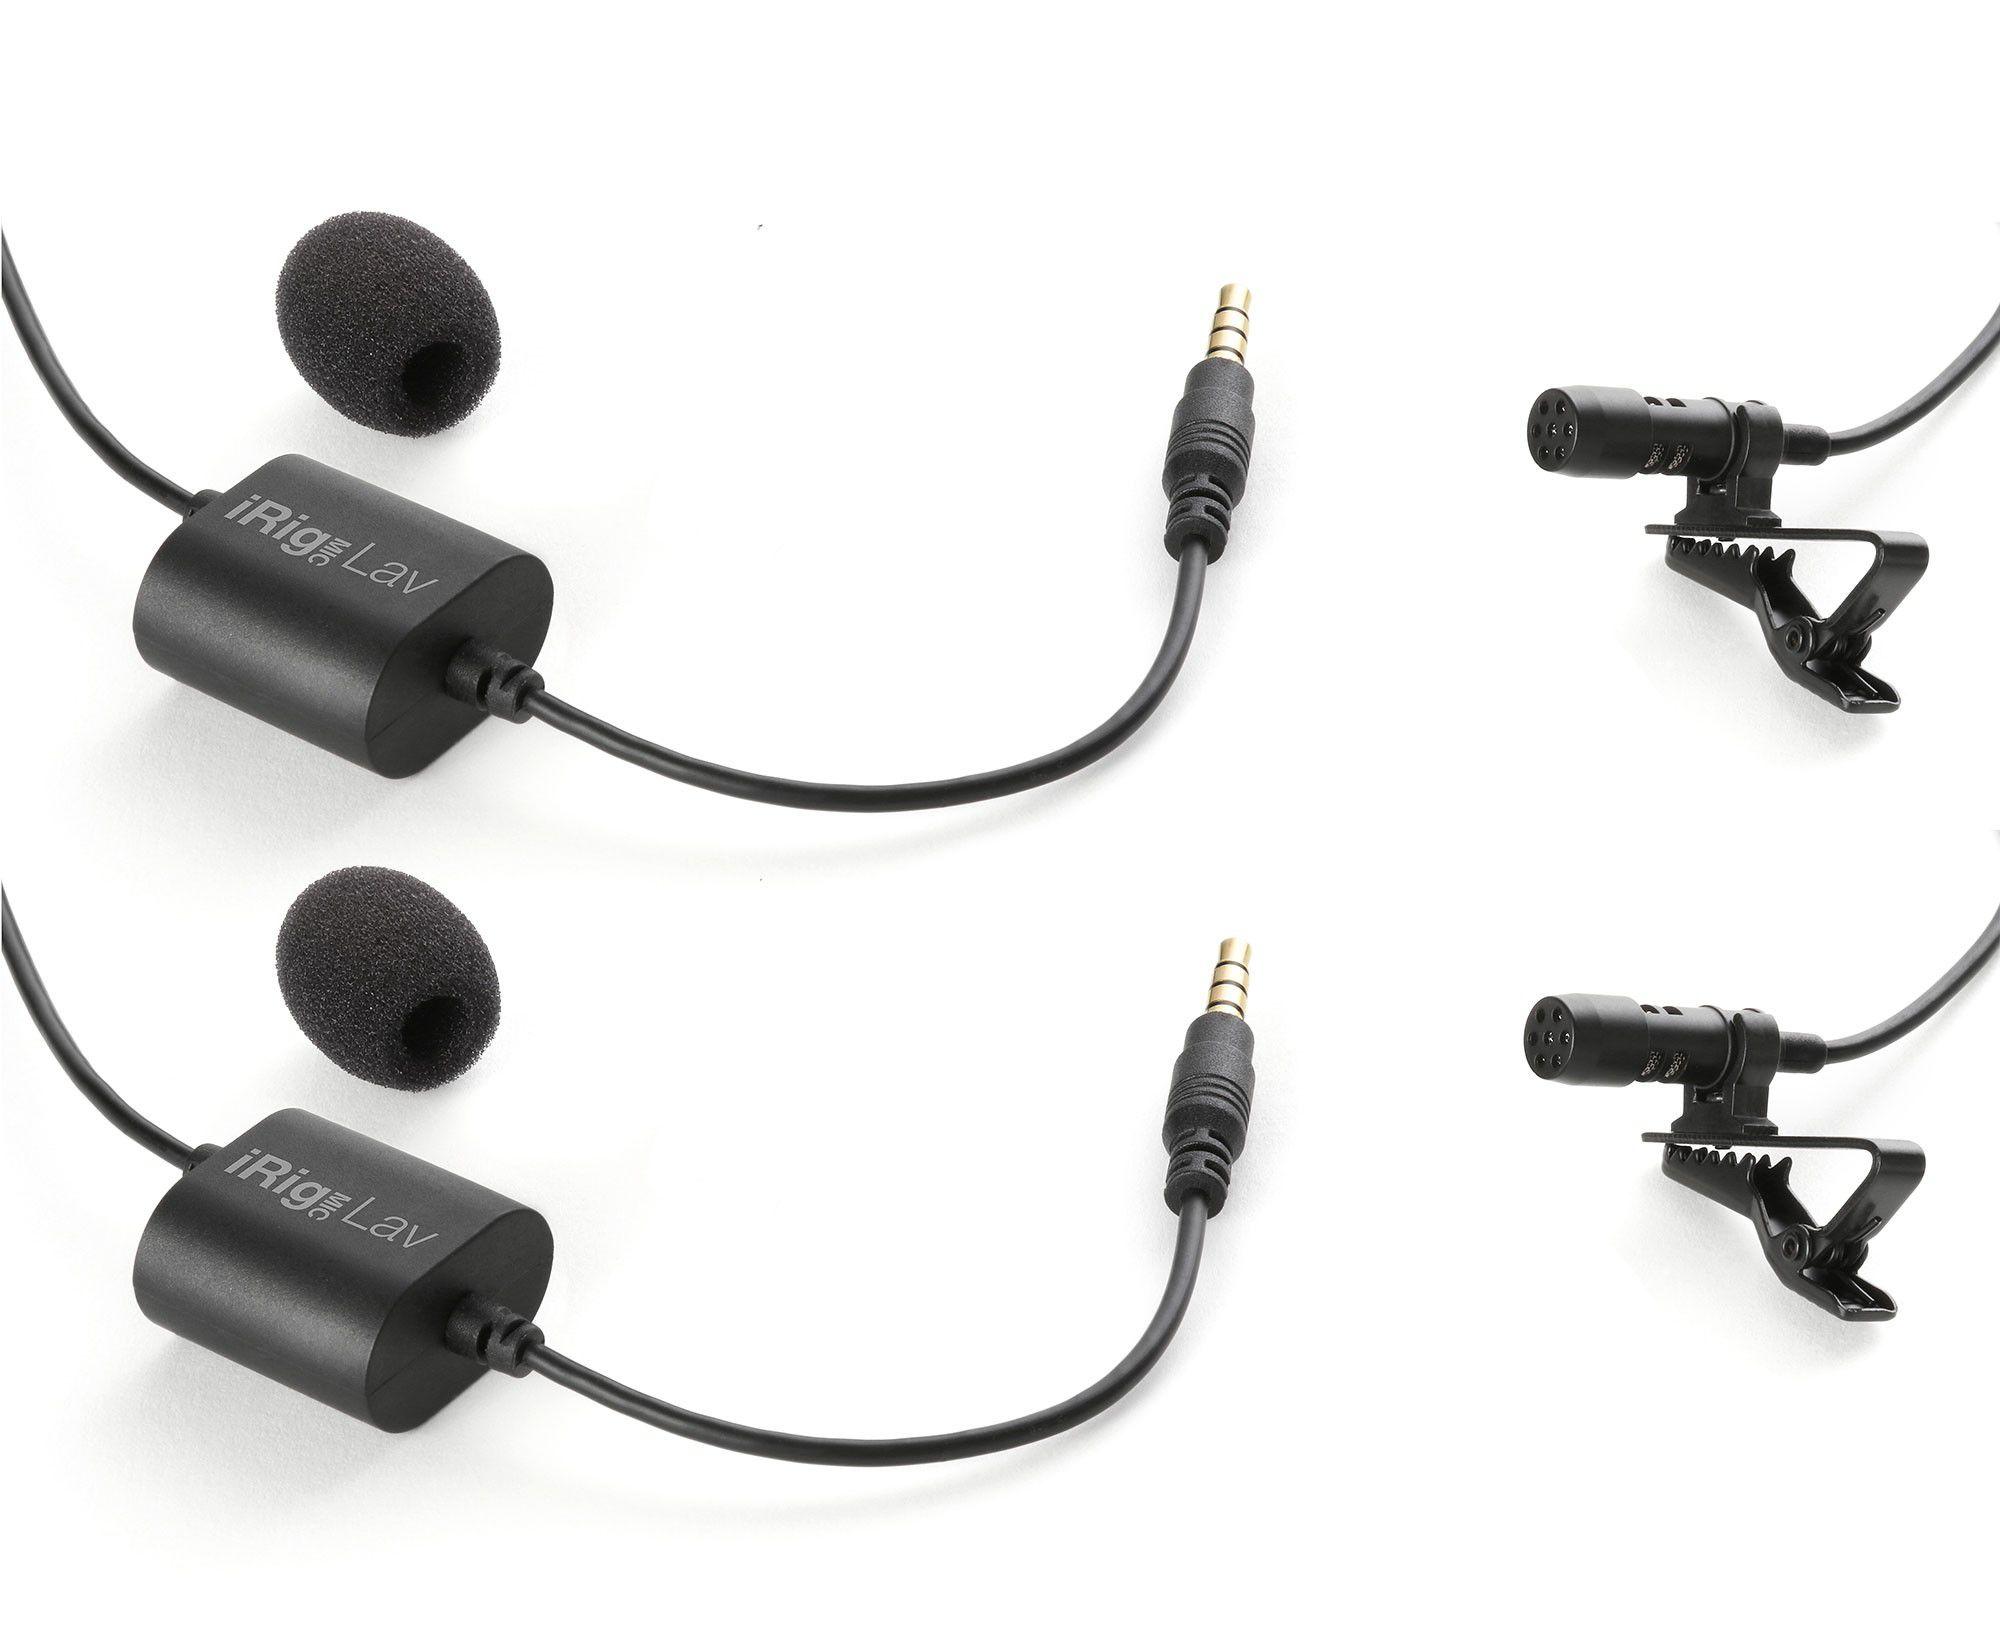 Par de microfones de lapela para Smartphone ou Tablet | IK Multimedia | iRig Mic Lav 2 Pack